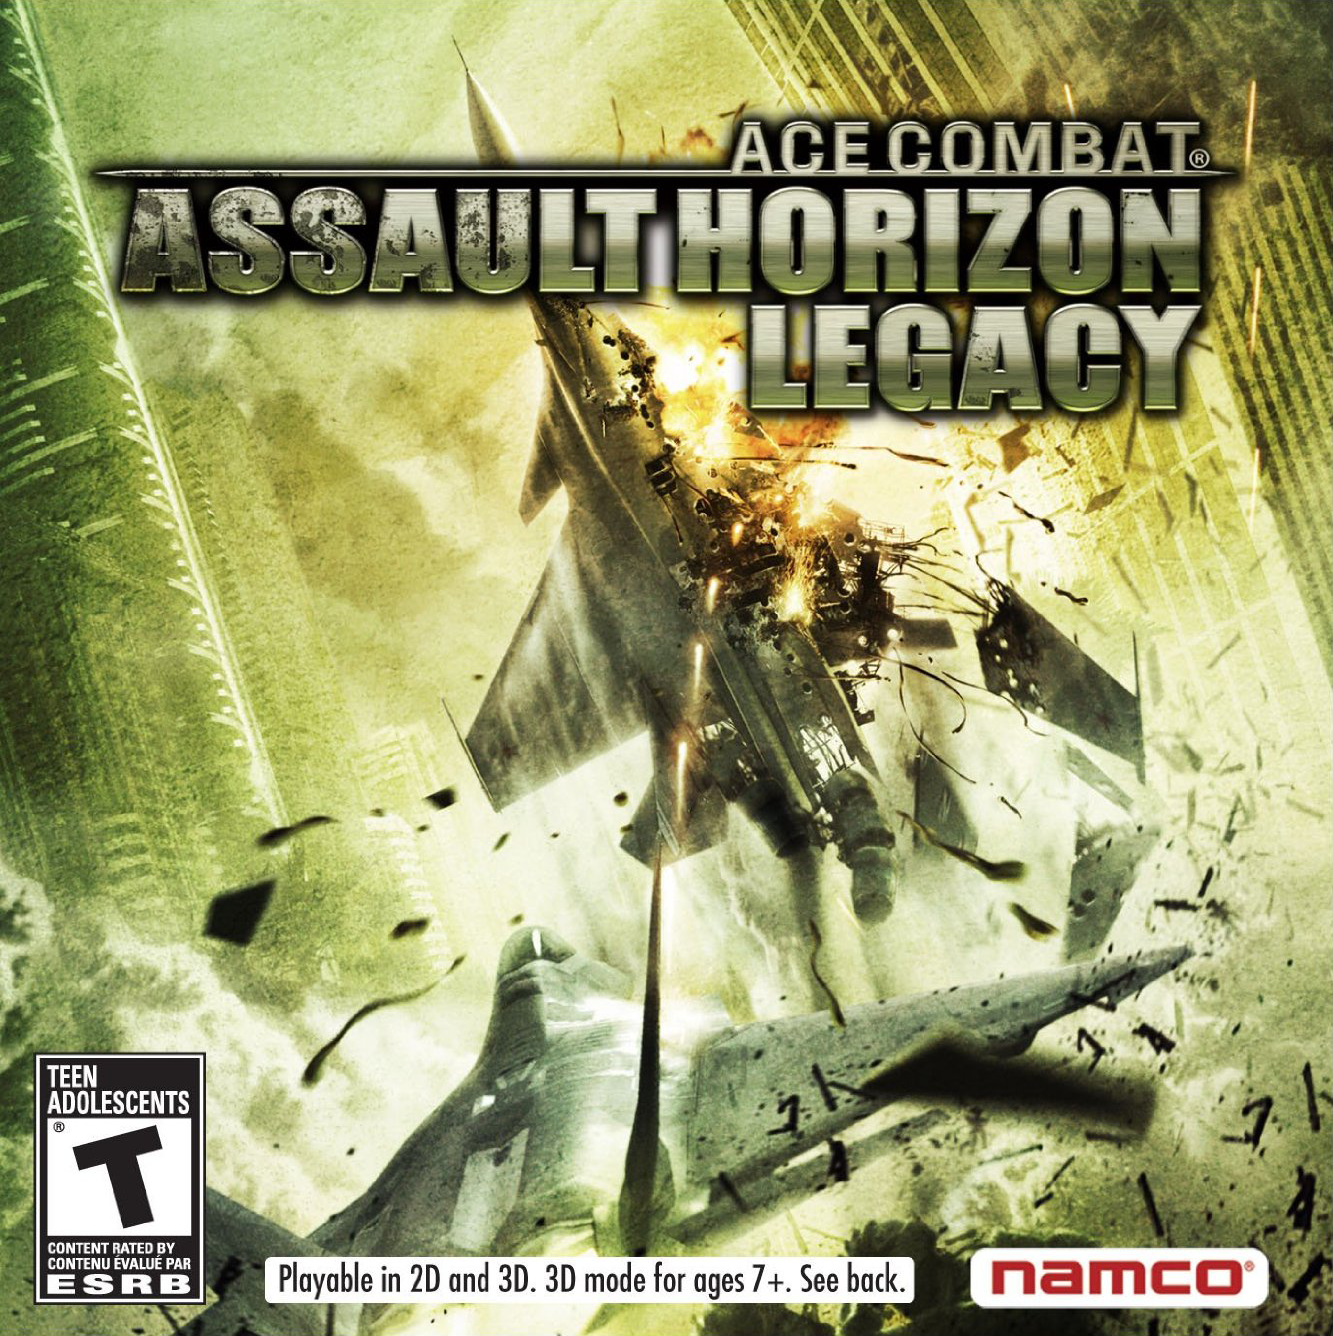 Arquivo:Assault Horizon Legacy cover.png